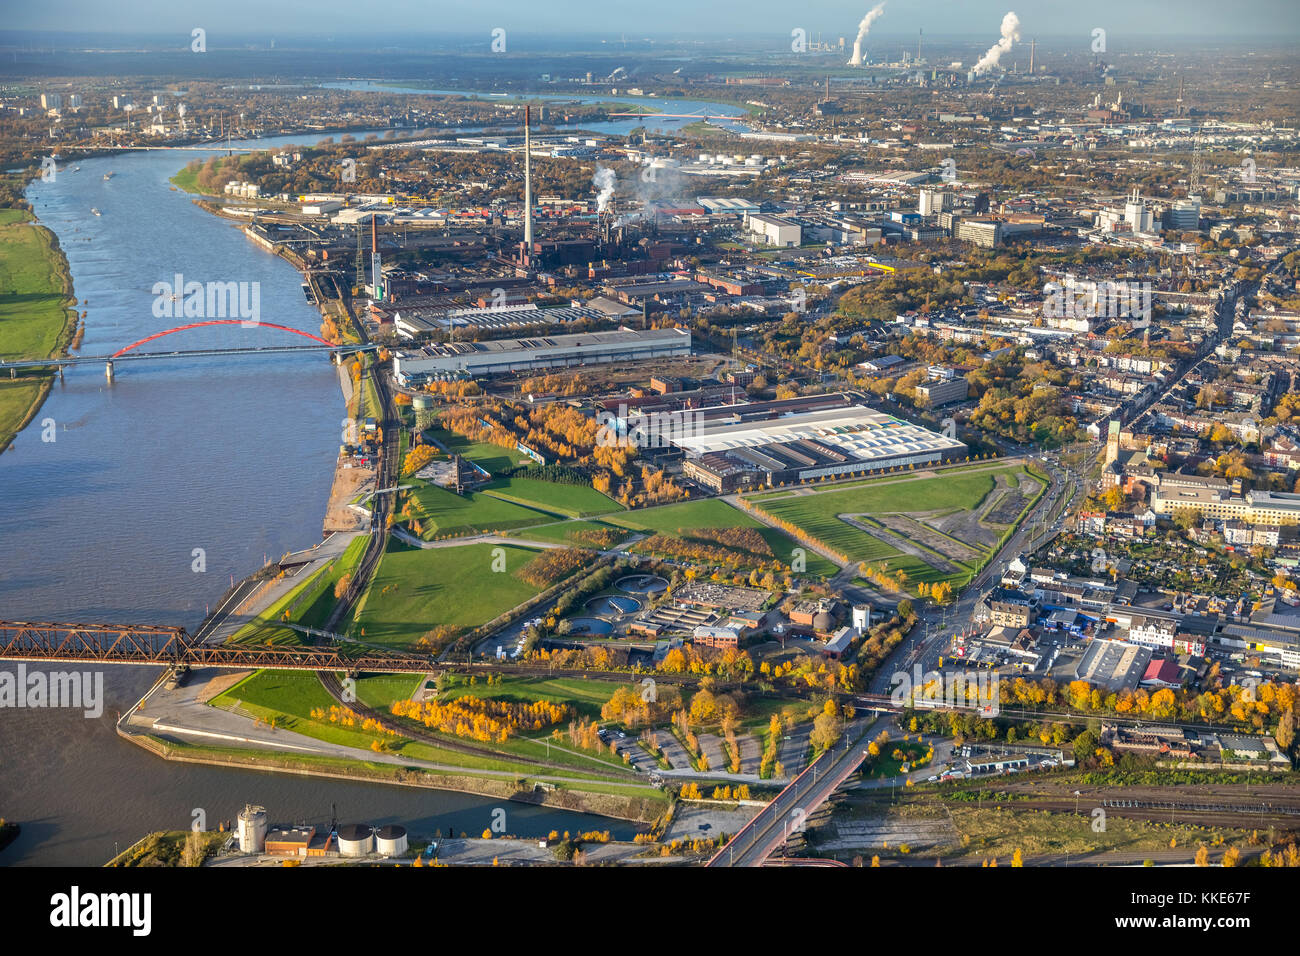 Rheinpark, Rhine, Skatepark Duisburg, Dickelsbach, Duisburg, Ruhr area, North Rhine-Westphalia, Germany, Duisburg, Stock Photo